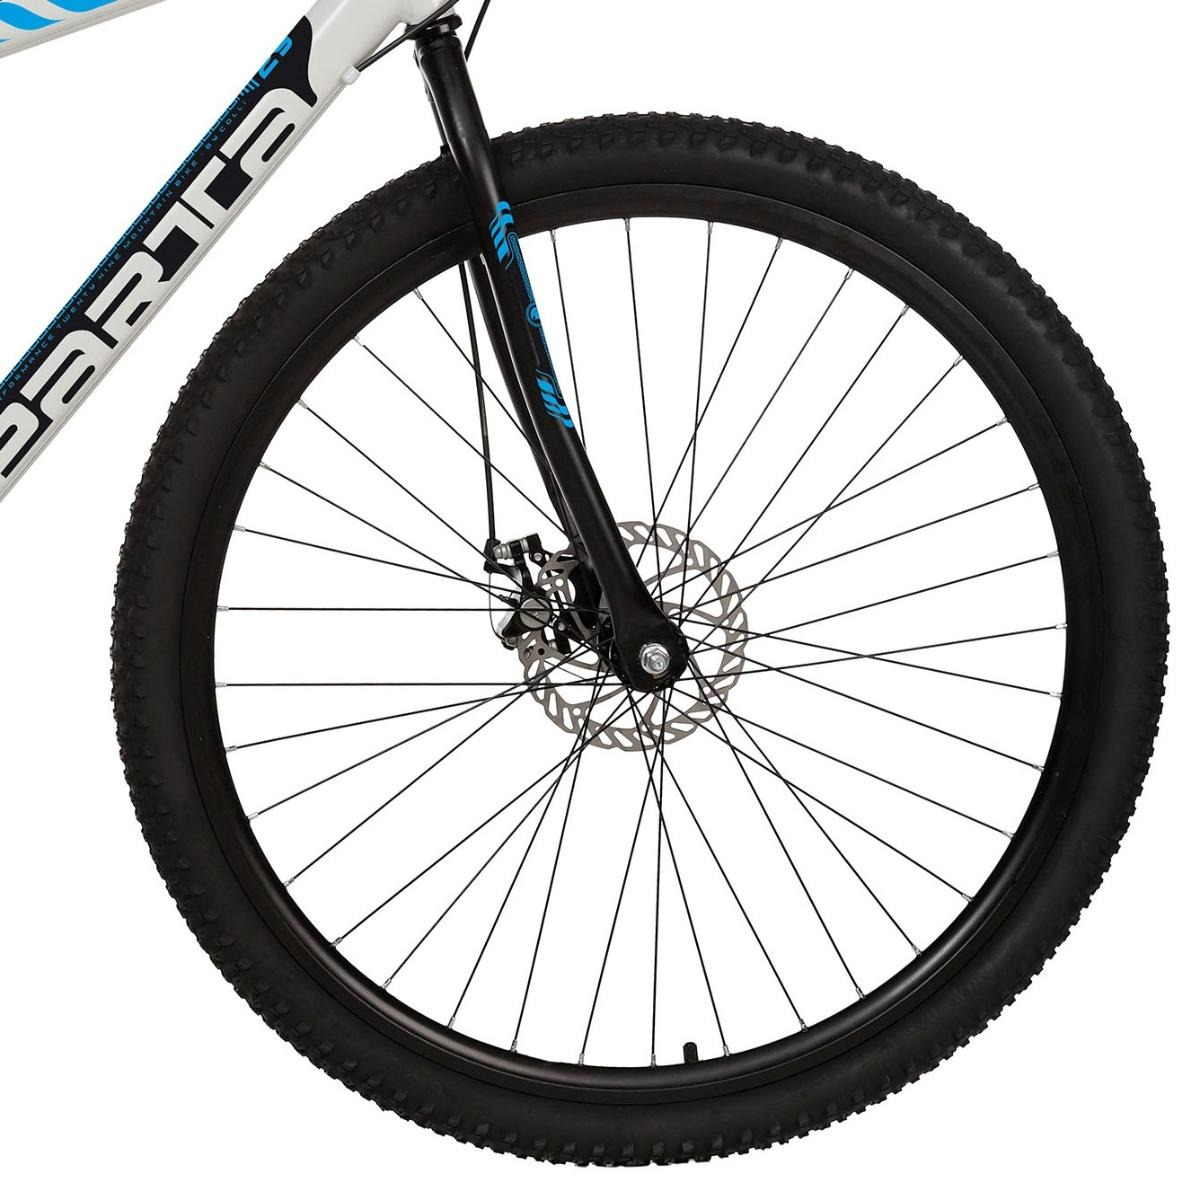 f5698426a bicicleta colli sparta mtb a29 21m a.aero f. disco - 415.05d. Carregando  zoom.